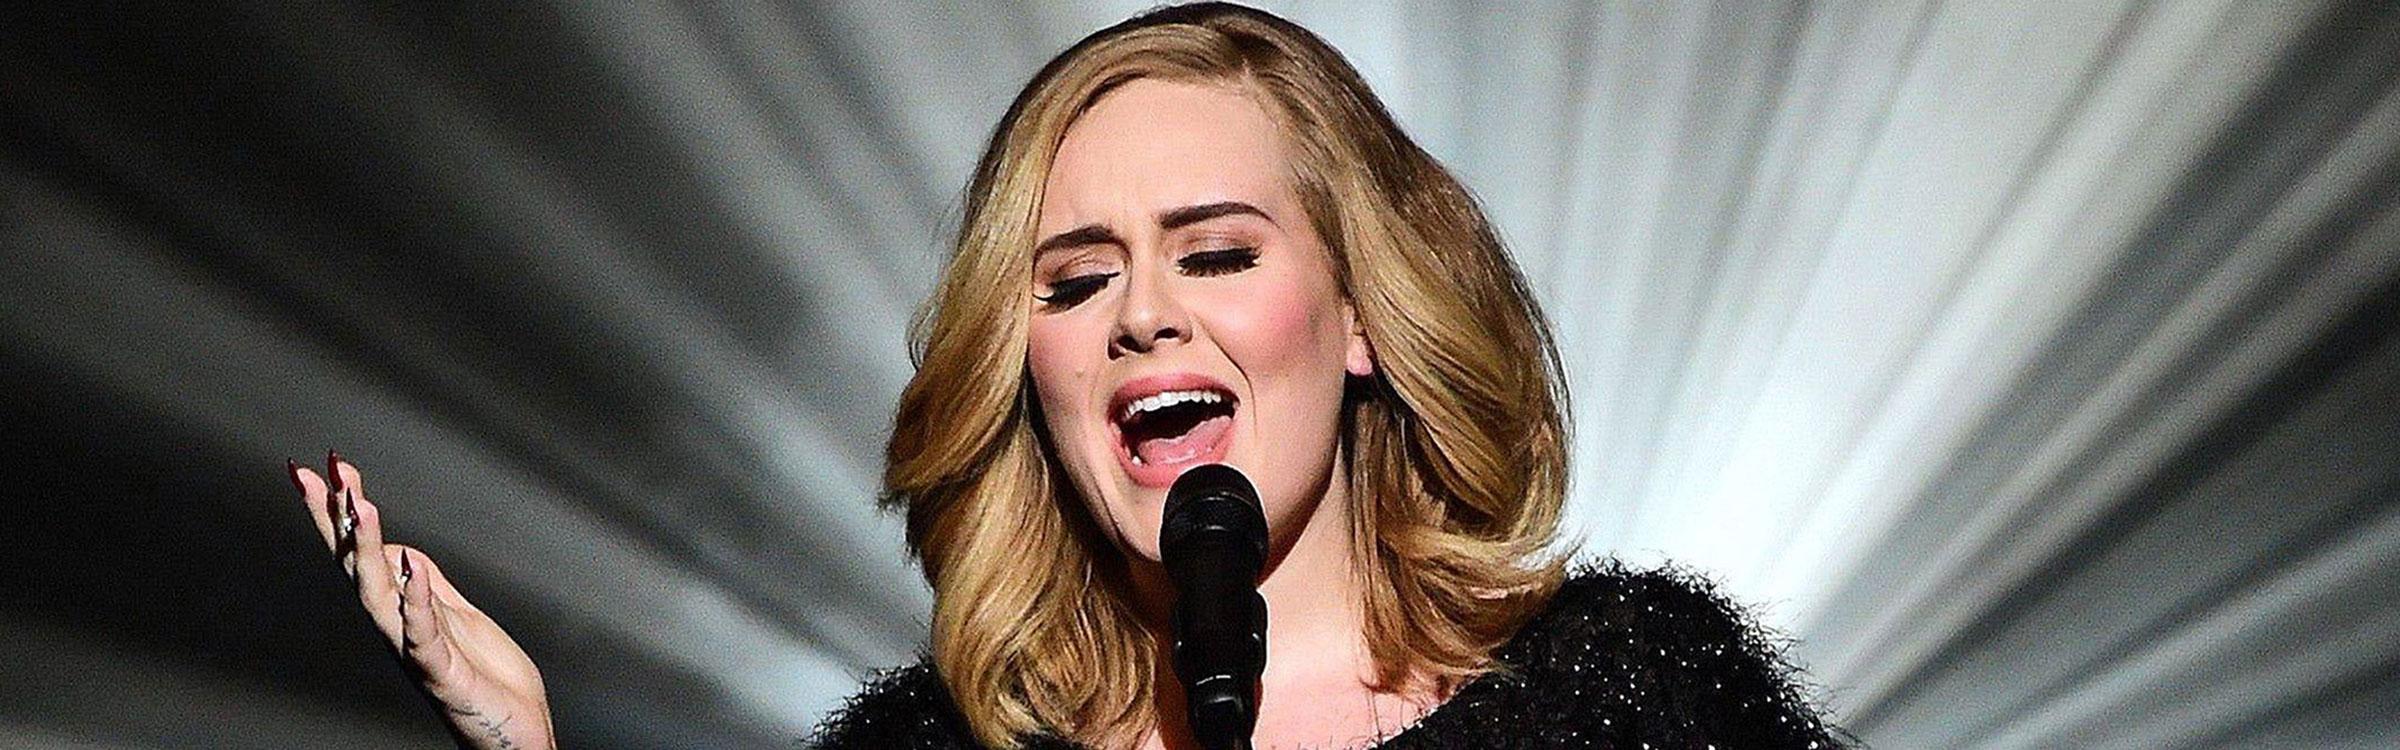 Adele 16